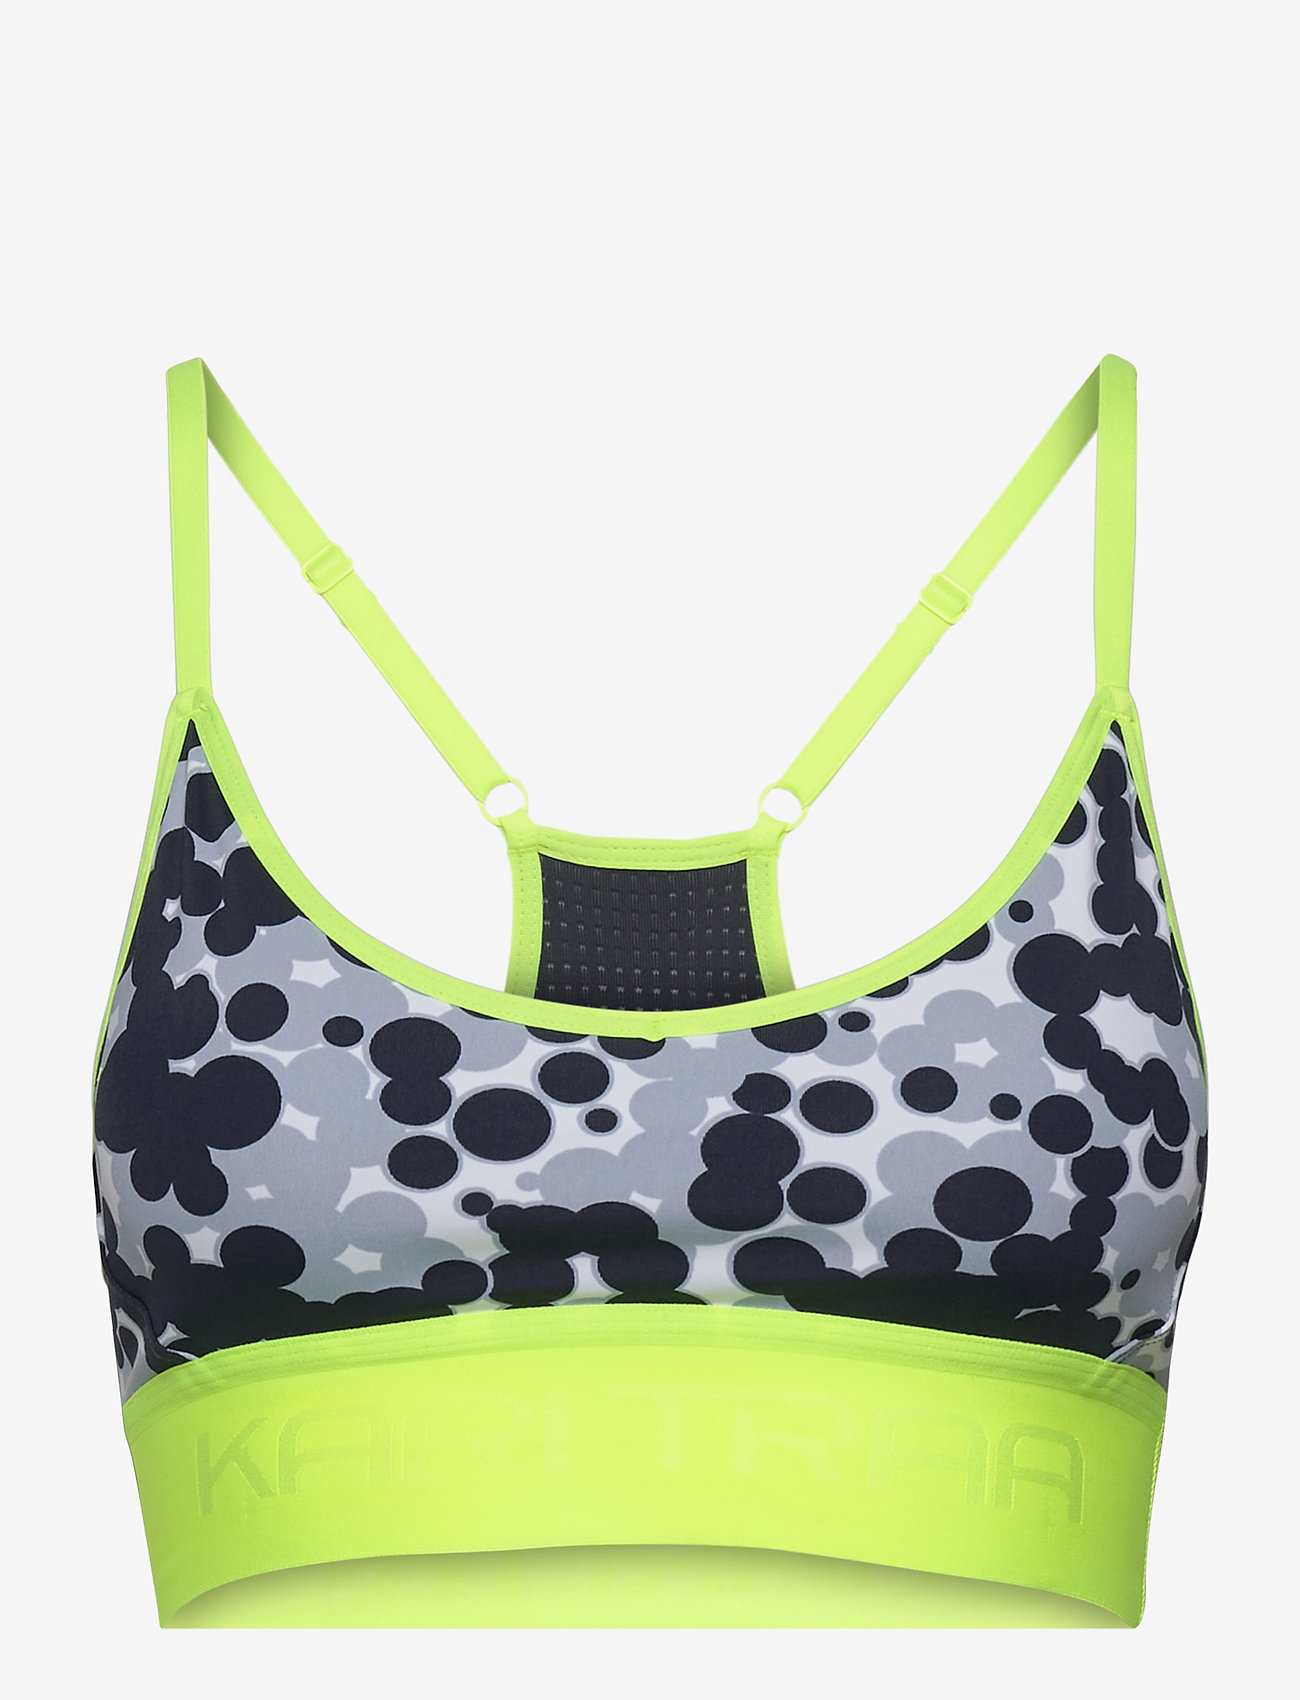 Kari Traa - VAR - sport bras: low - misty - 1